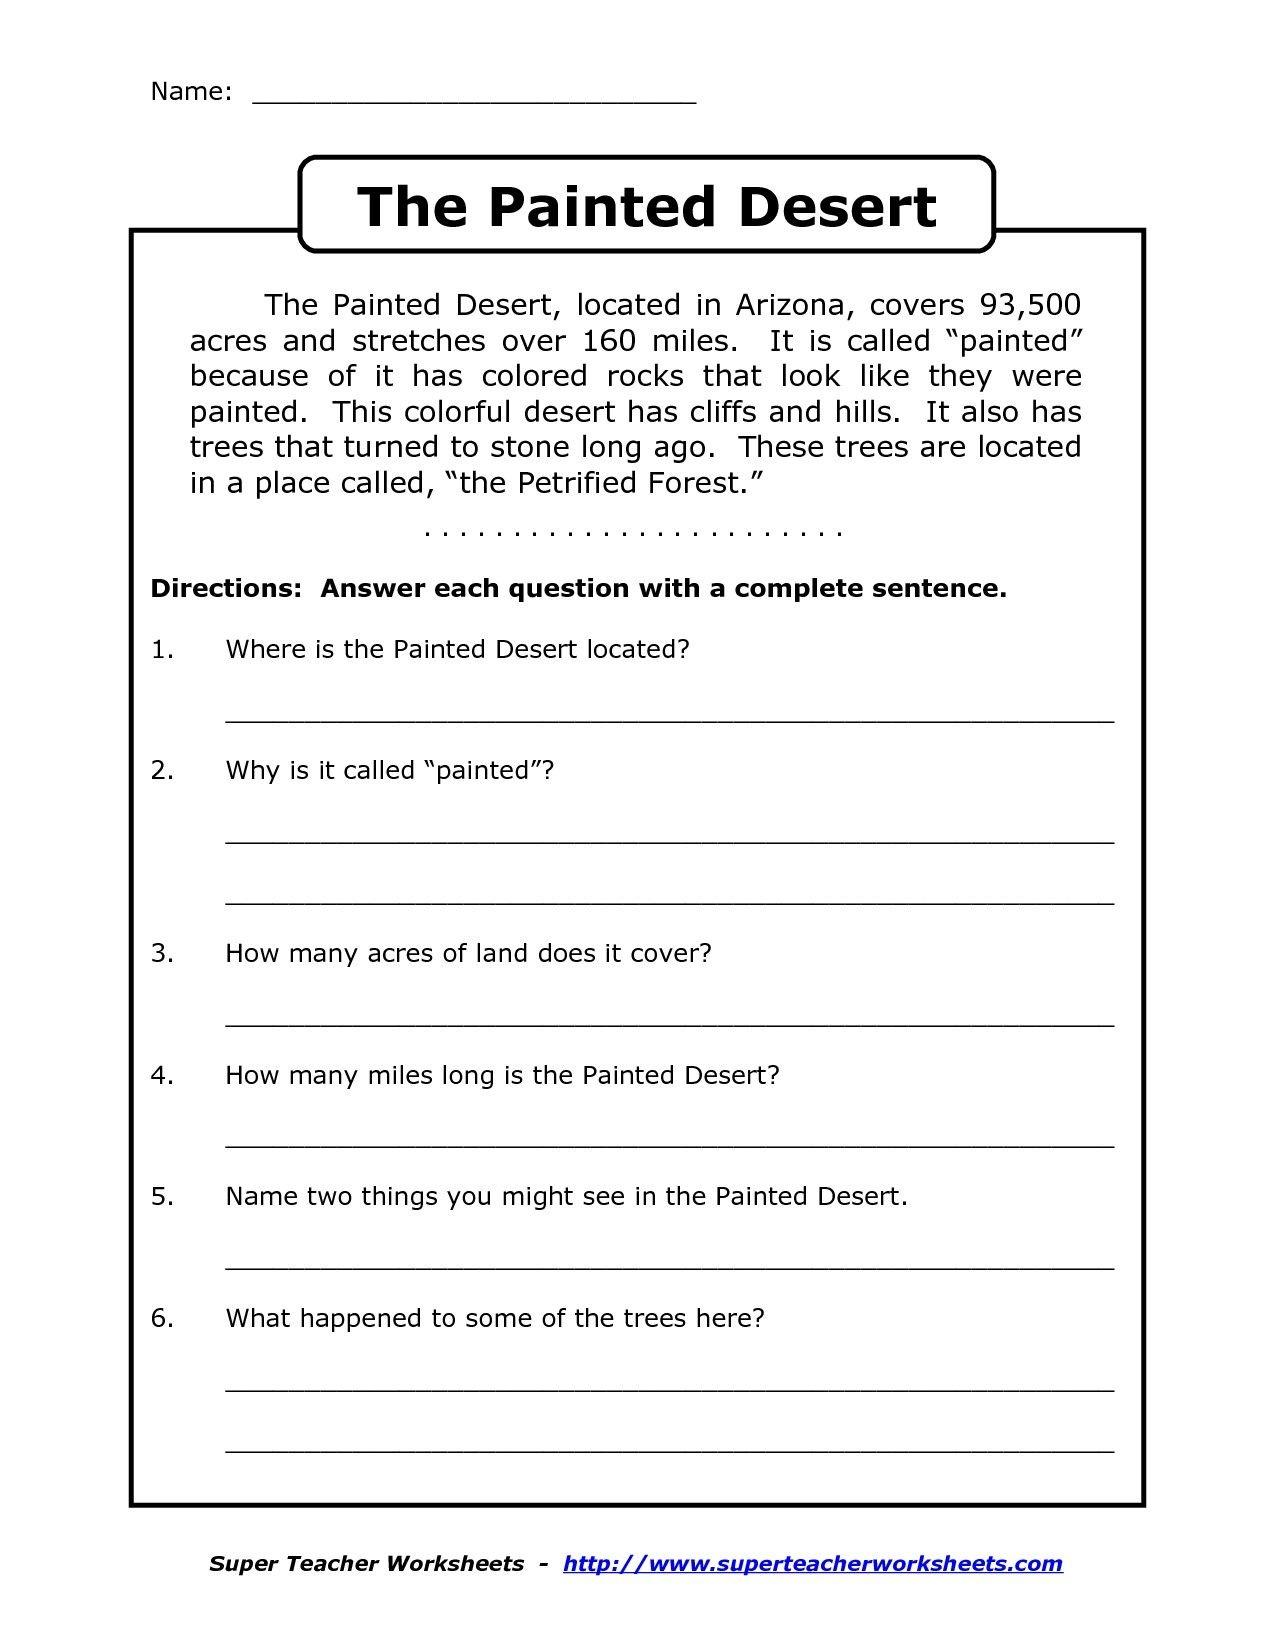 Image Result For Free Printable Worksheets For Grade 4 Comprehension - Free Printable Comprehension Worksheets For Grade 5